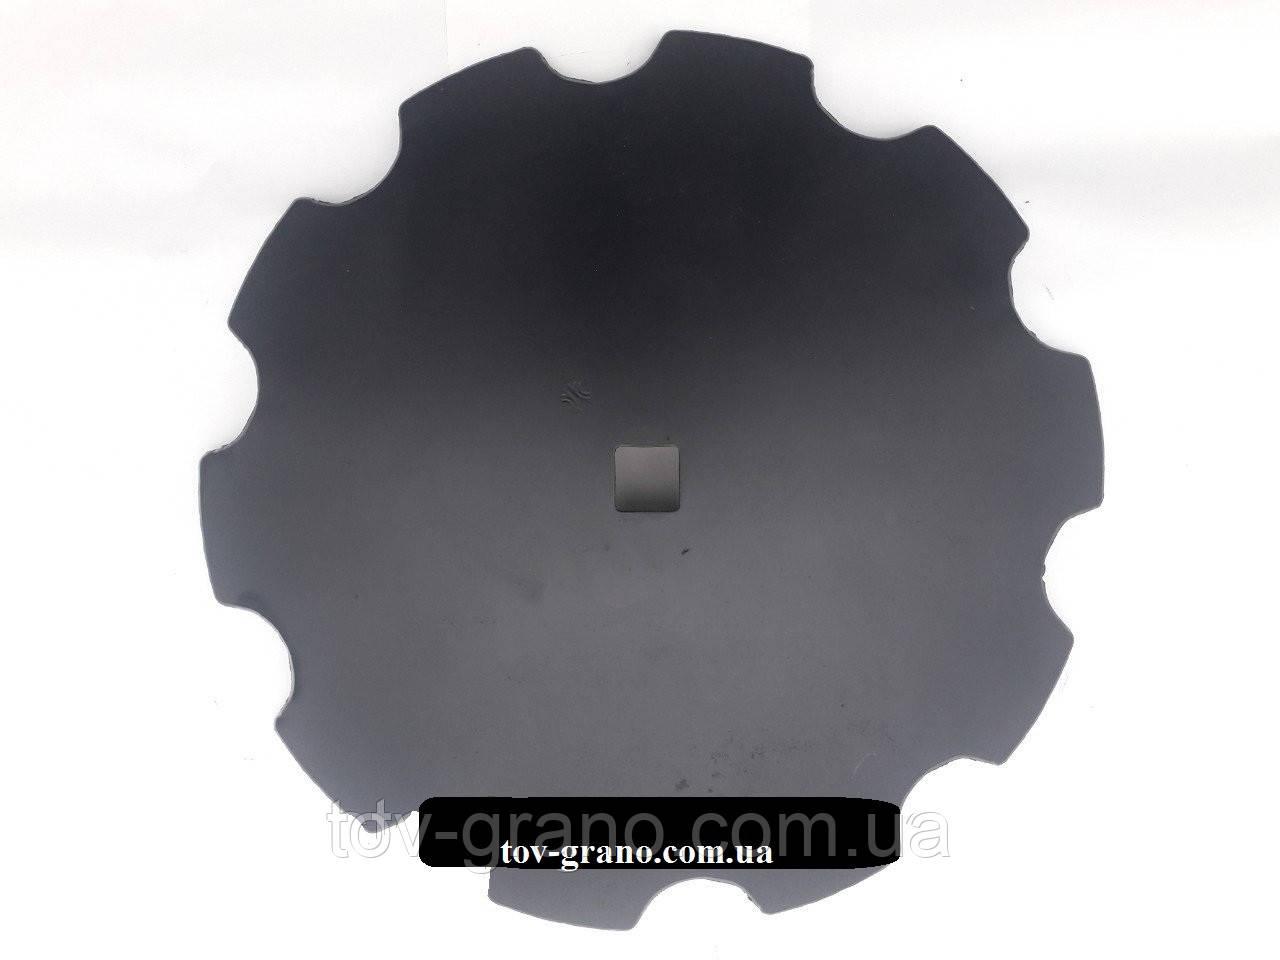 Диск бороны Kverneland 650 мм. кв.42. Z=10мм. тощина 8мм.